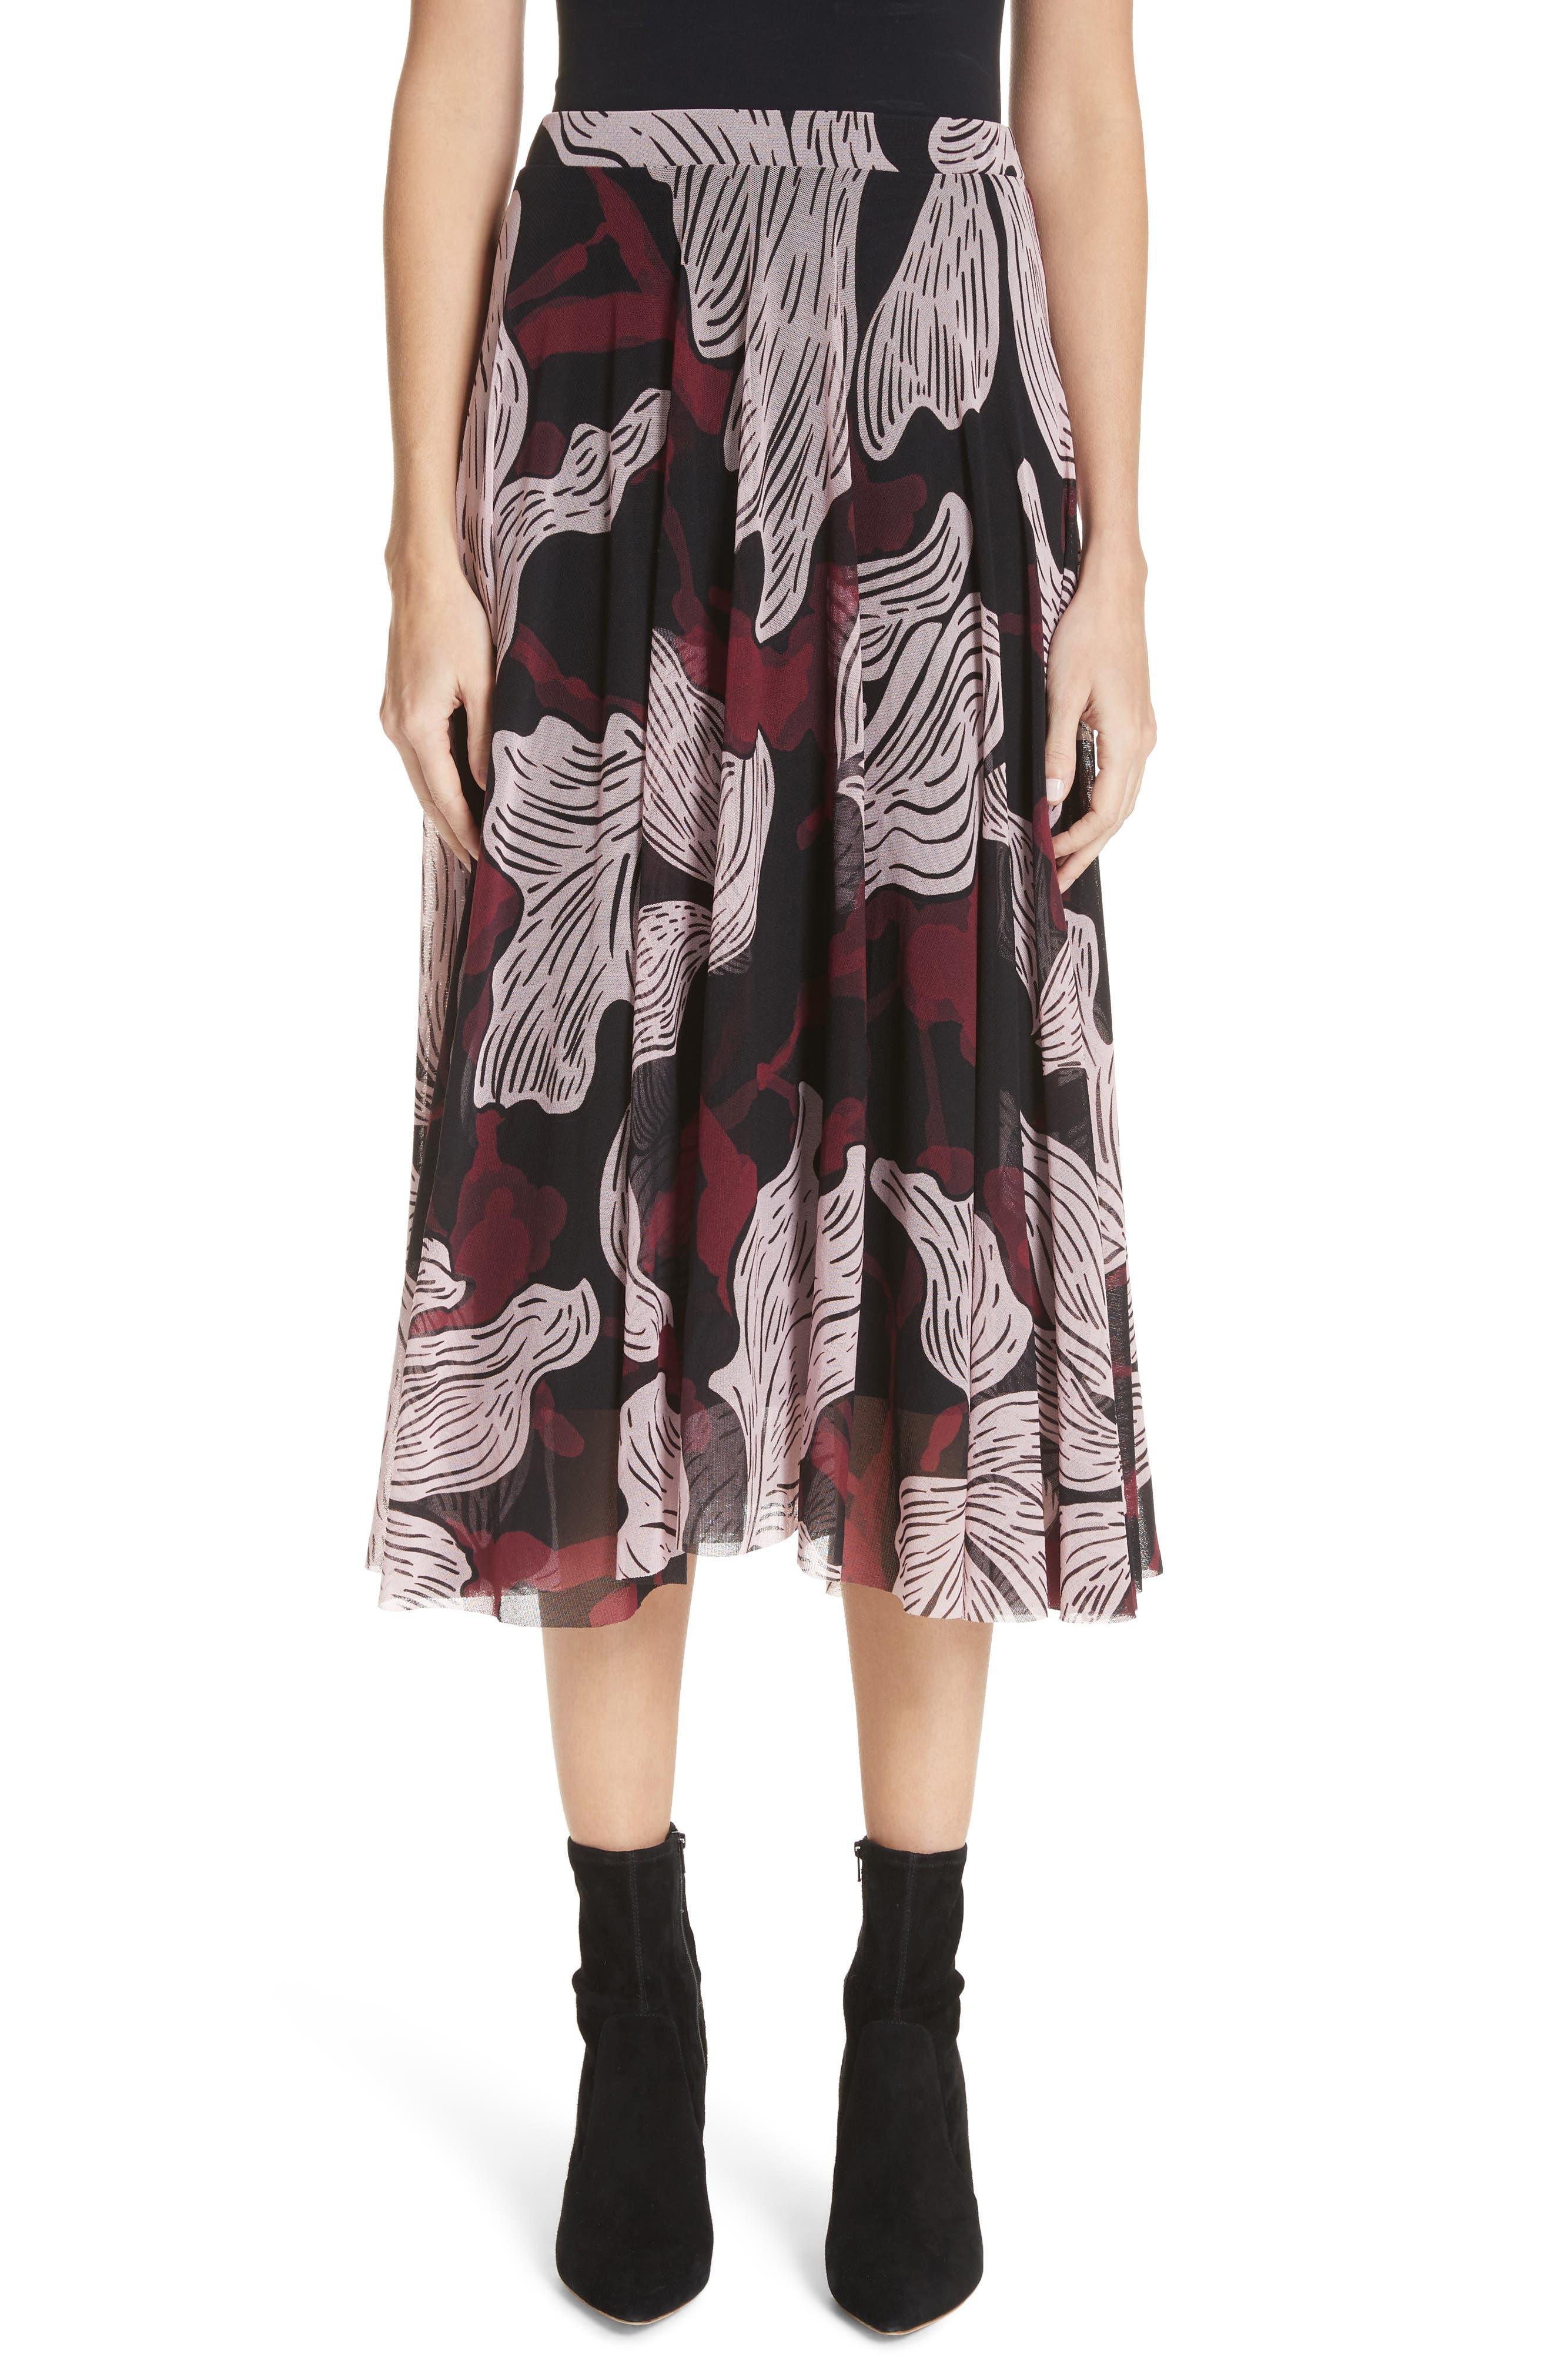 Fuzzi Deco Floral Print Tulle Midi Skirt, Burgundy